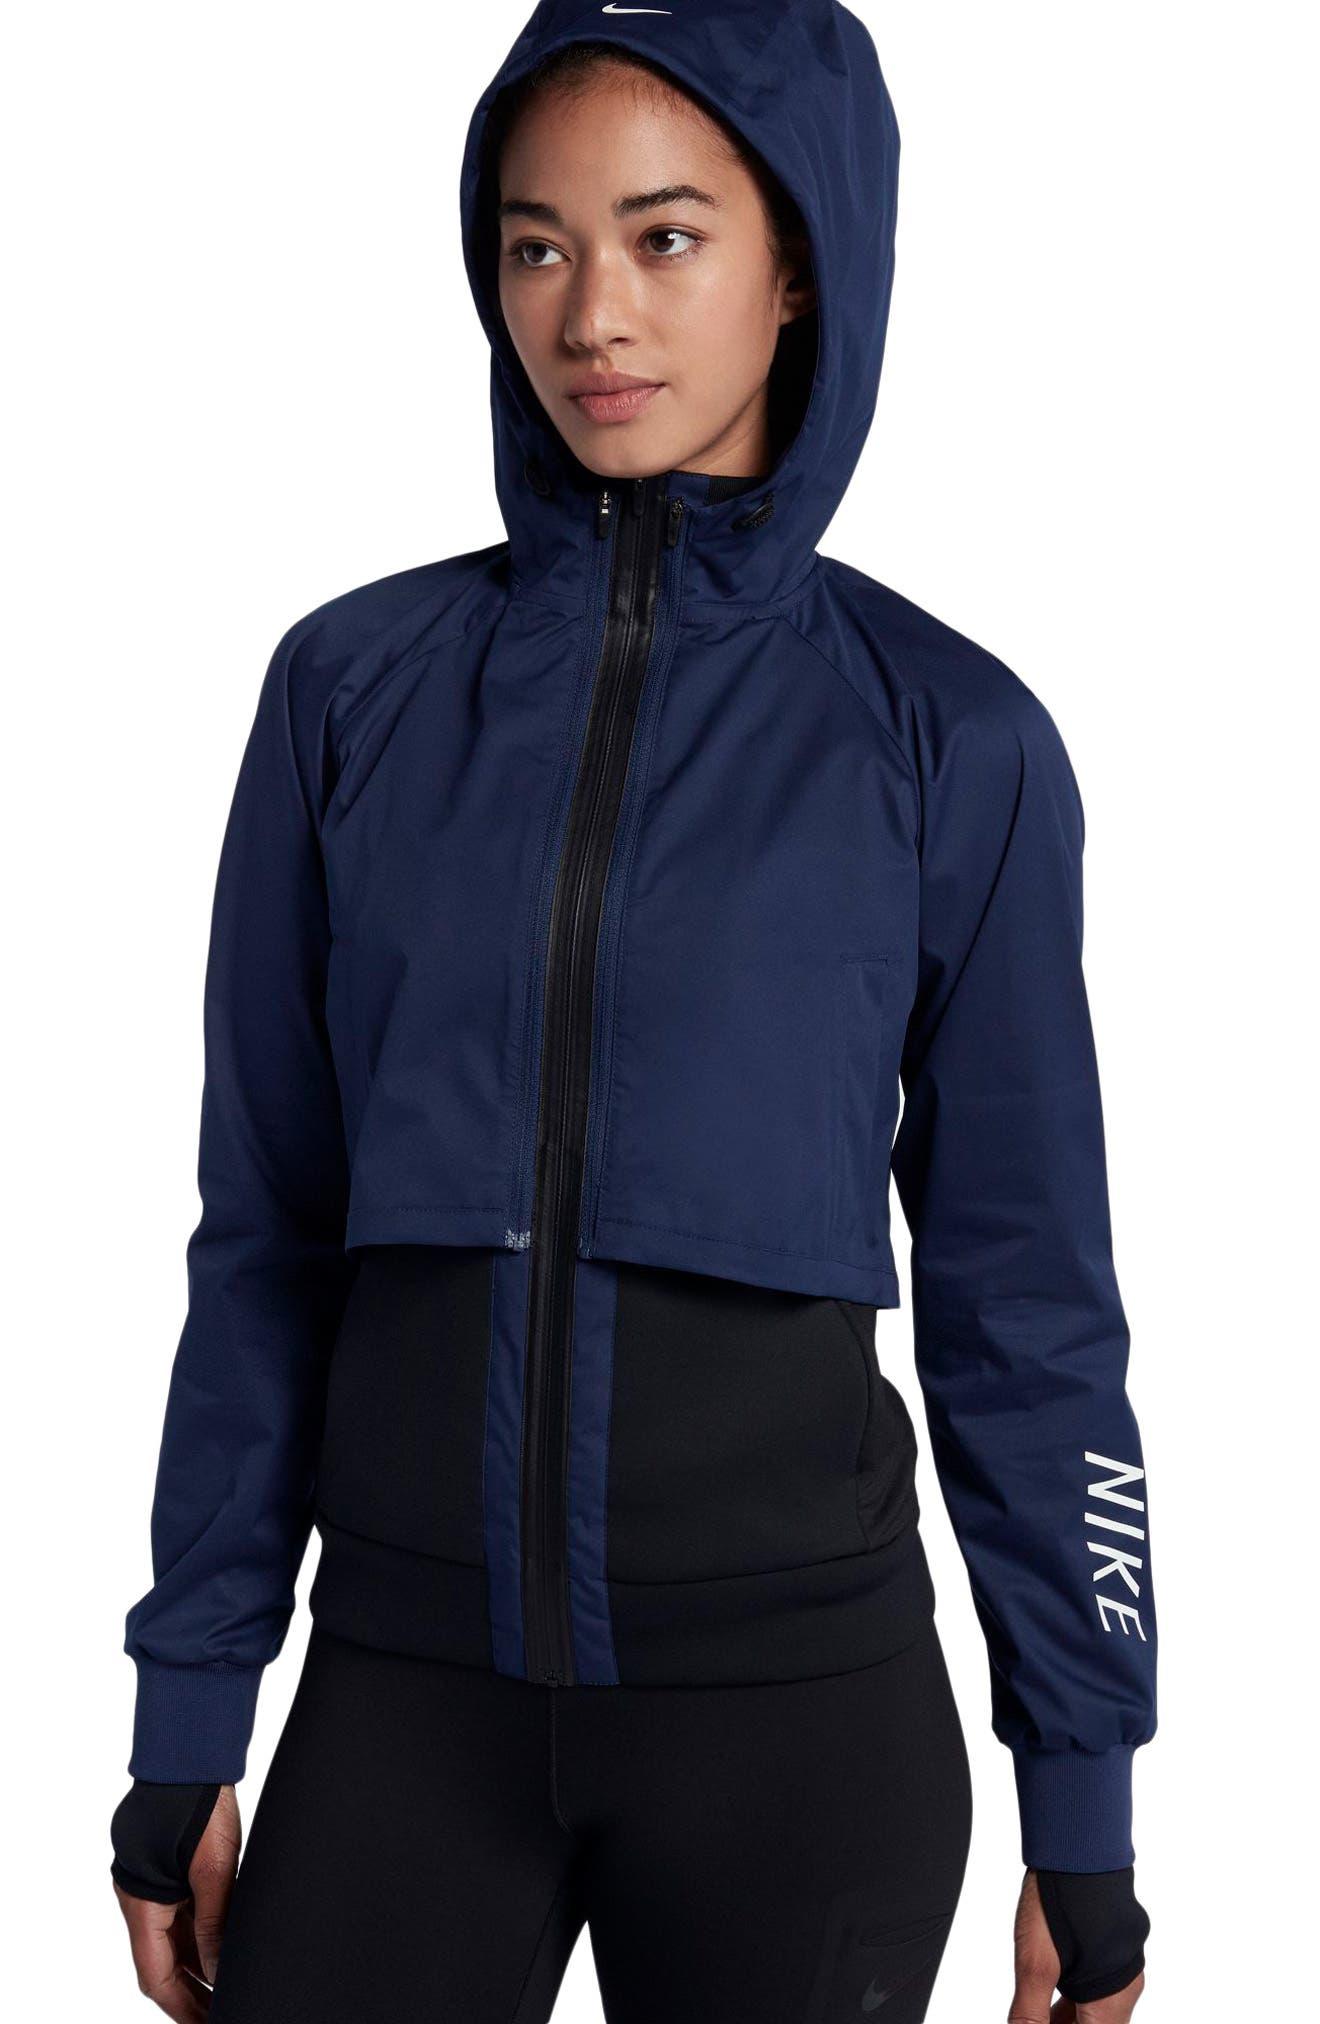 Therma Shield 2-in-1 Training Jacket,                             Main thumbnail 1, color,                             429